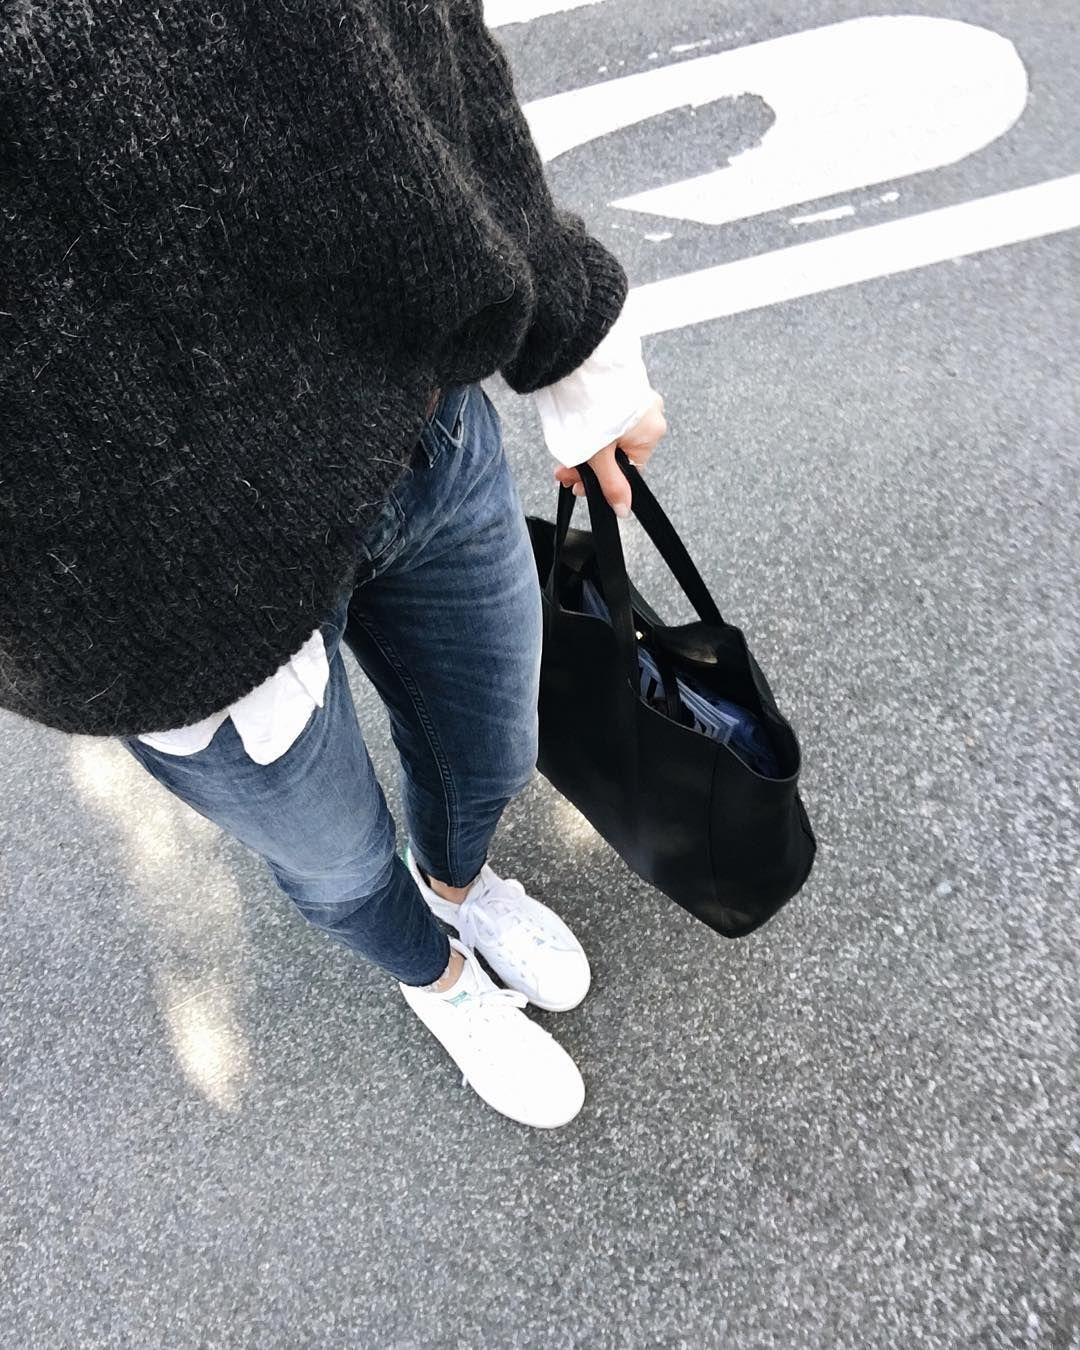 "referencia Inadecuado itálico  Eider Paskual on Instagram: ""Bilbo there we go! @mumubags @zatroshop #ootd  #girlz #adidasoriginals""   Fashion, Style, Autumn winter fashion"